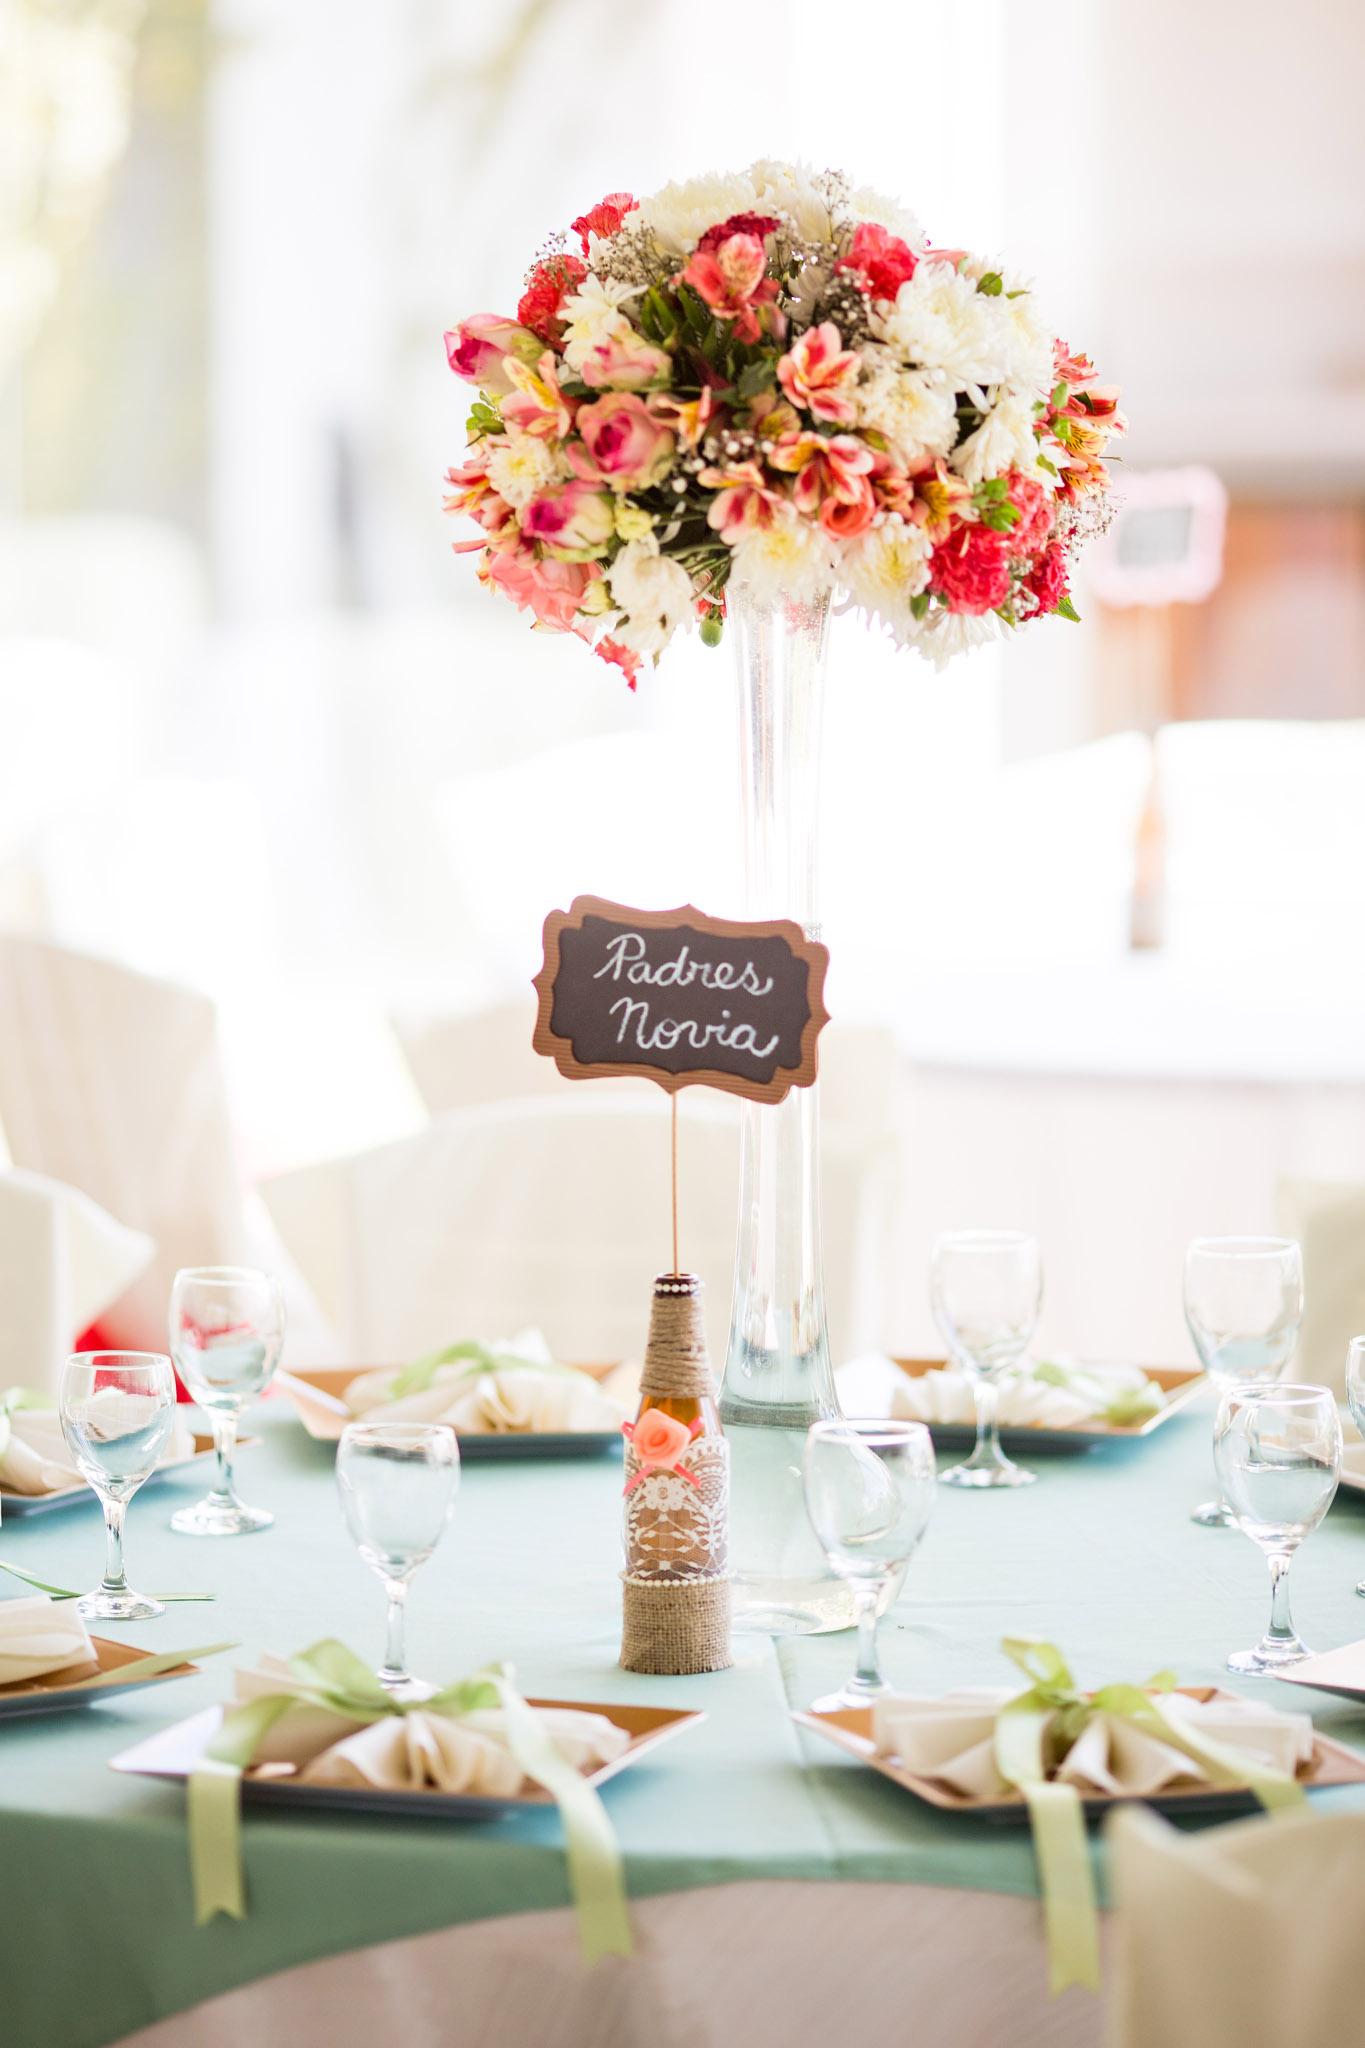 wedding-bolivia-la-paz-reception-table-decoration